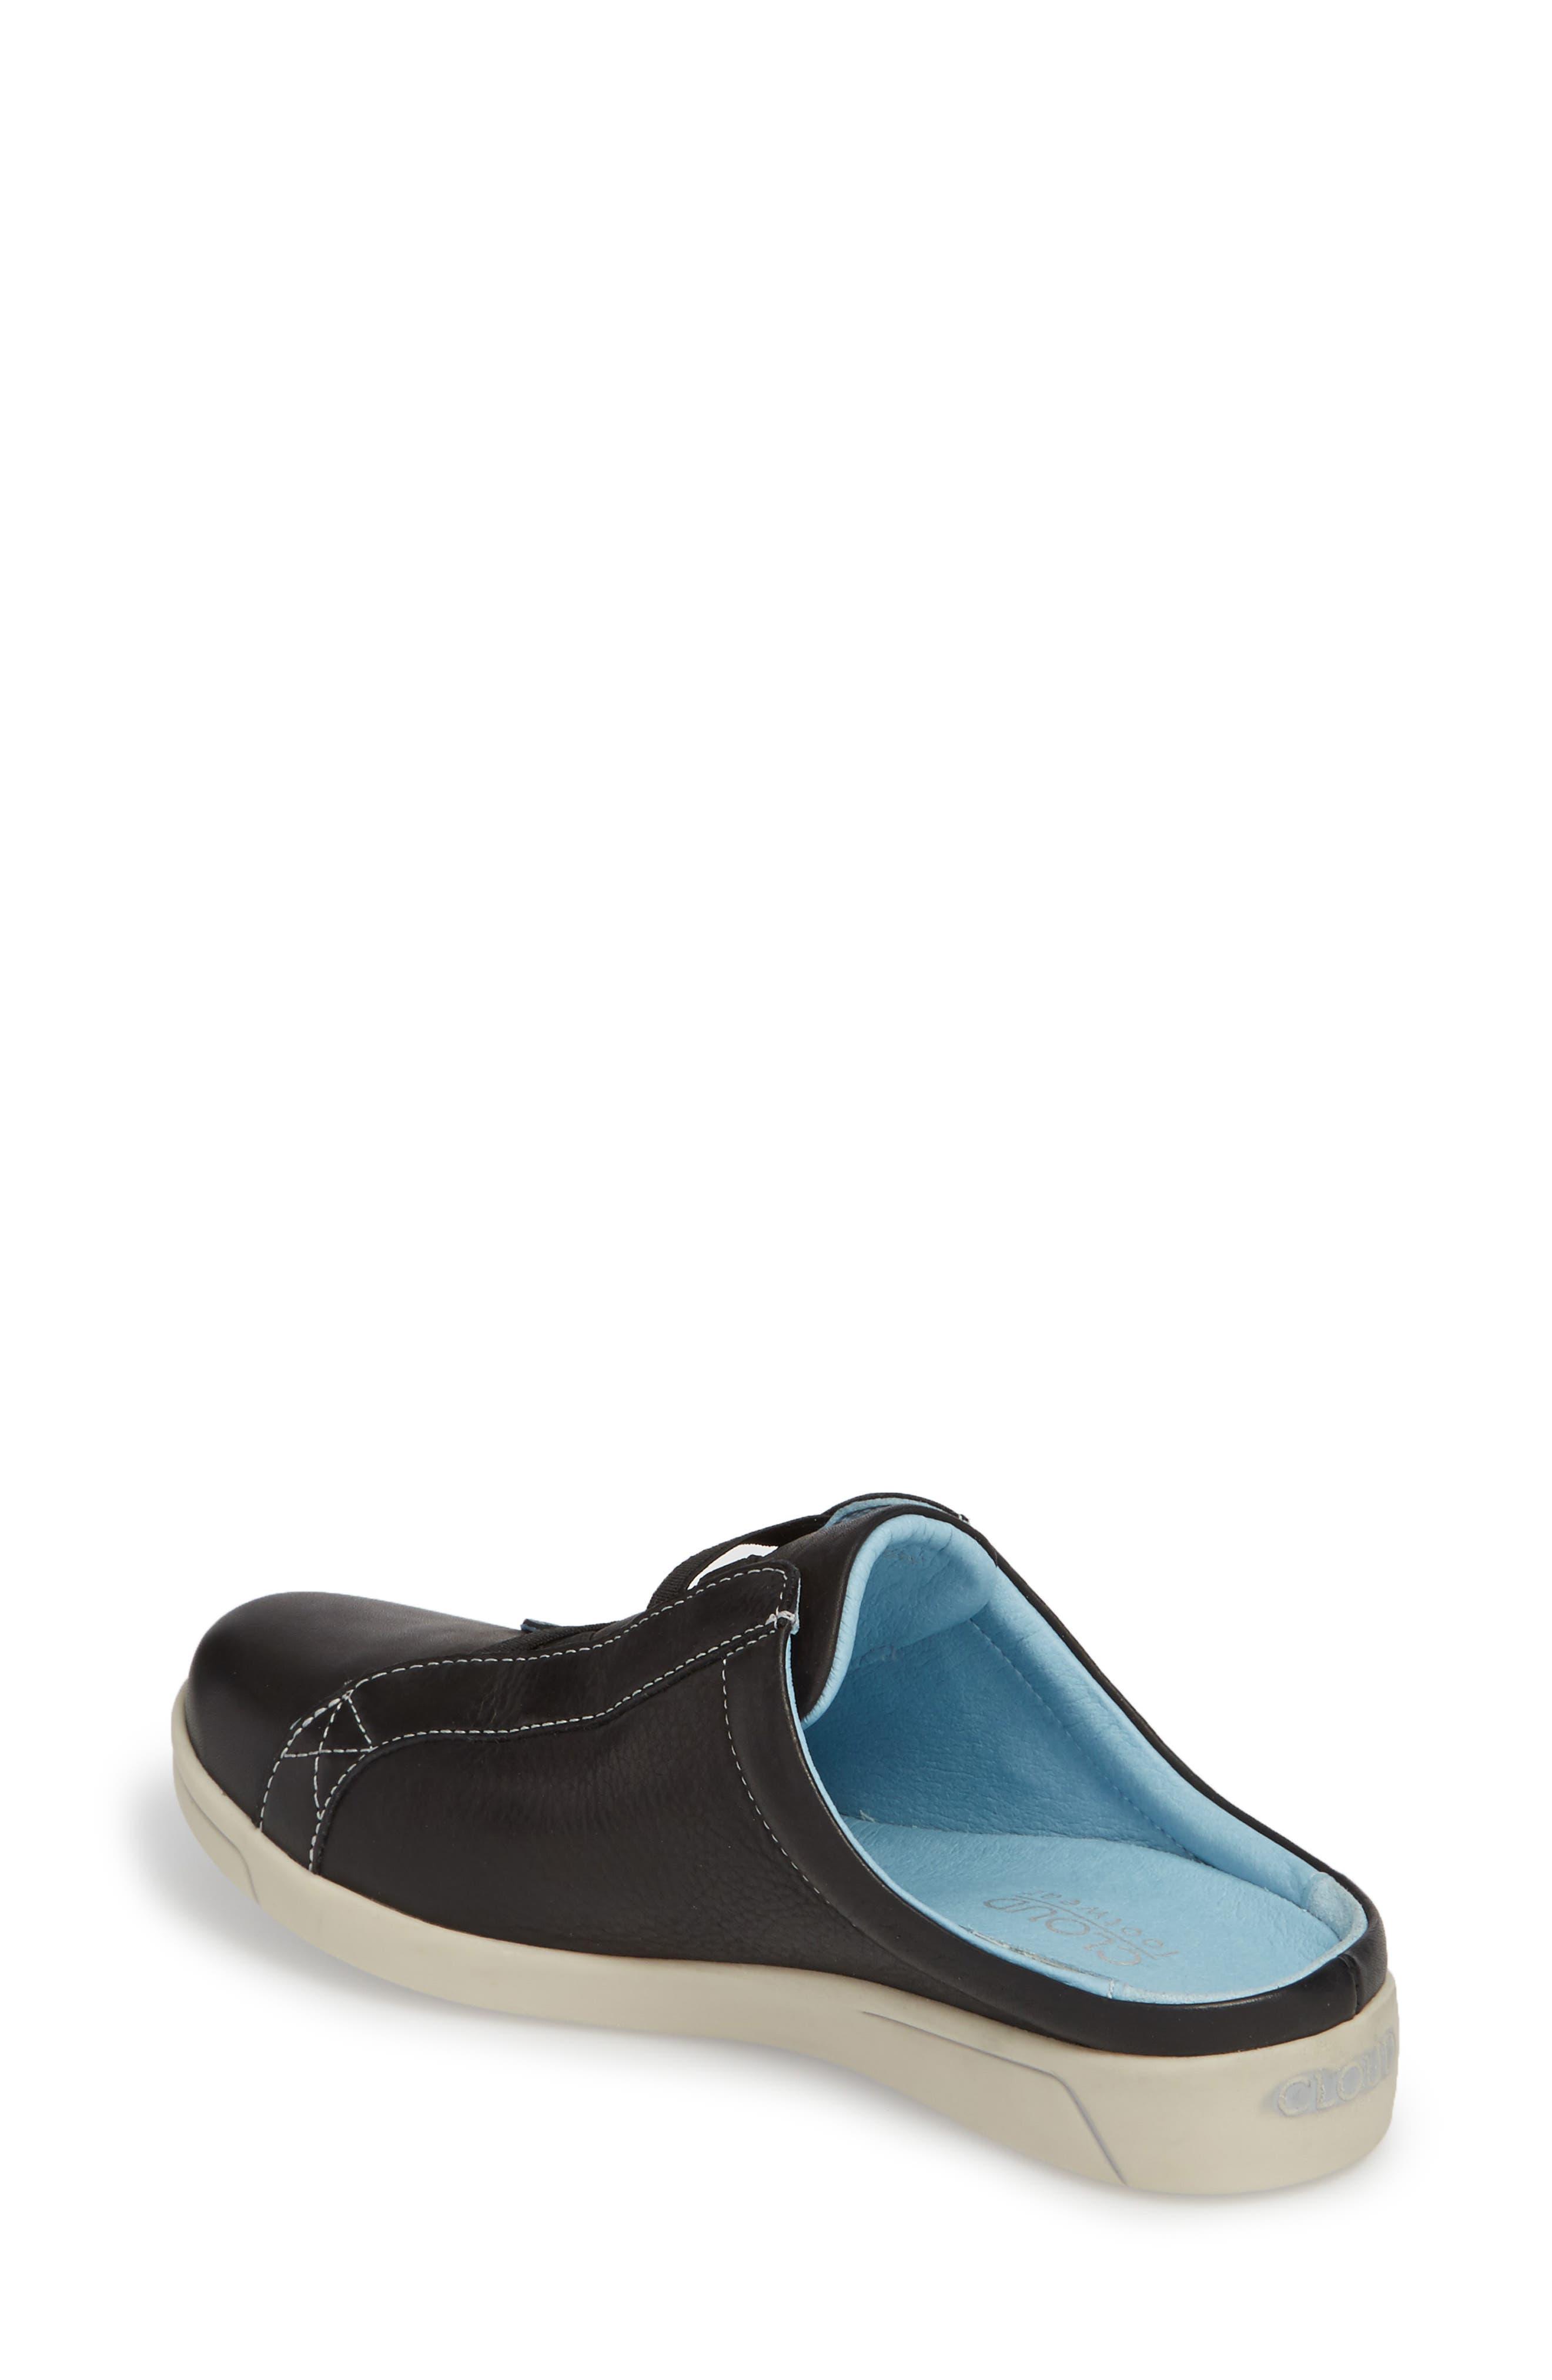 Arizona Sneaker,                             Alternate thumbnail 2, color,                             BLACK LEATHER